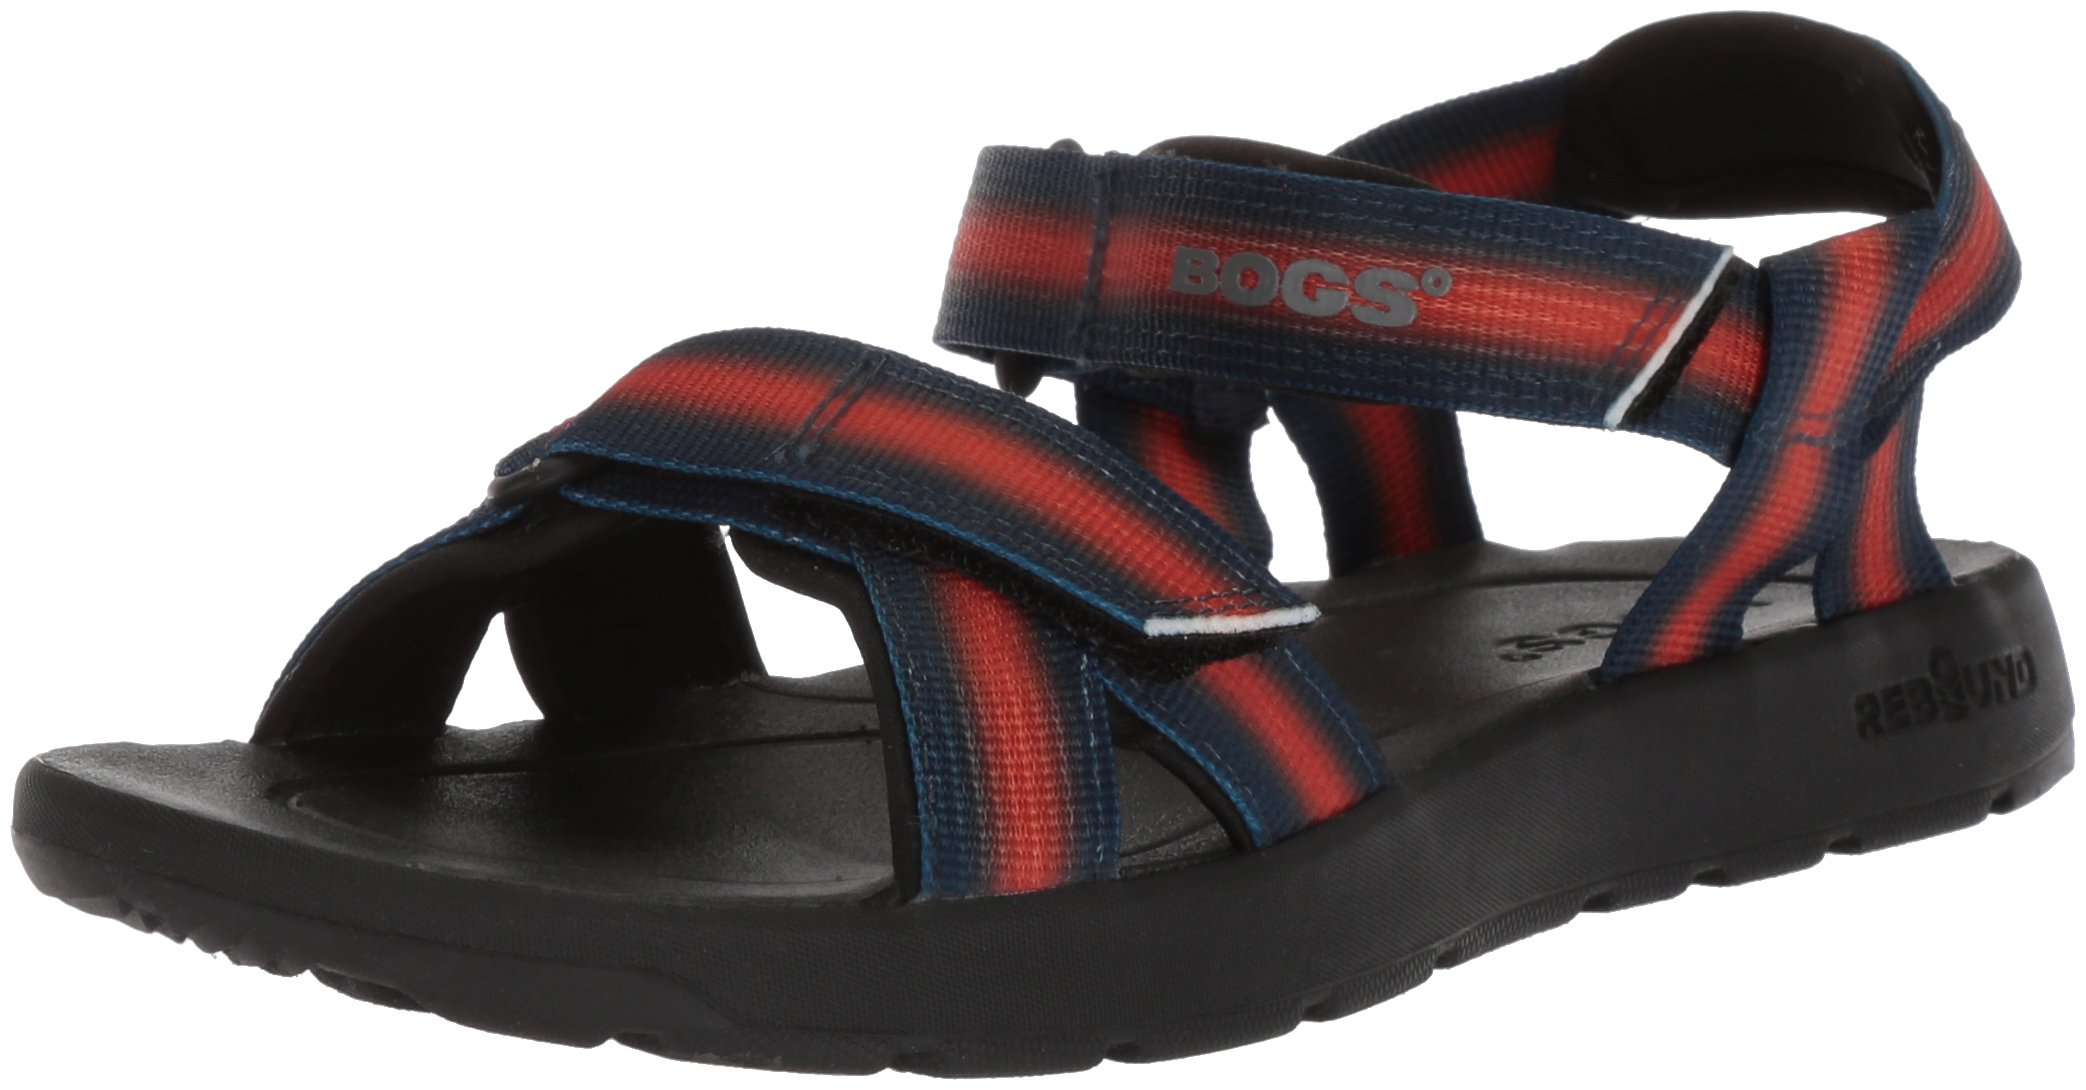 Bogs Kids/Toddler Rio Watersports Athletic Boys and Girls Sandal, Sunrise/Blue/Multi, 10 M US Toddler